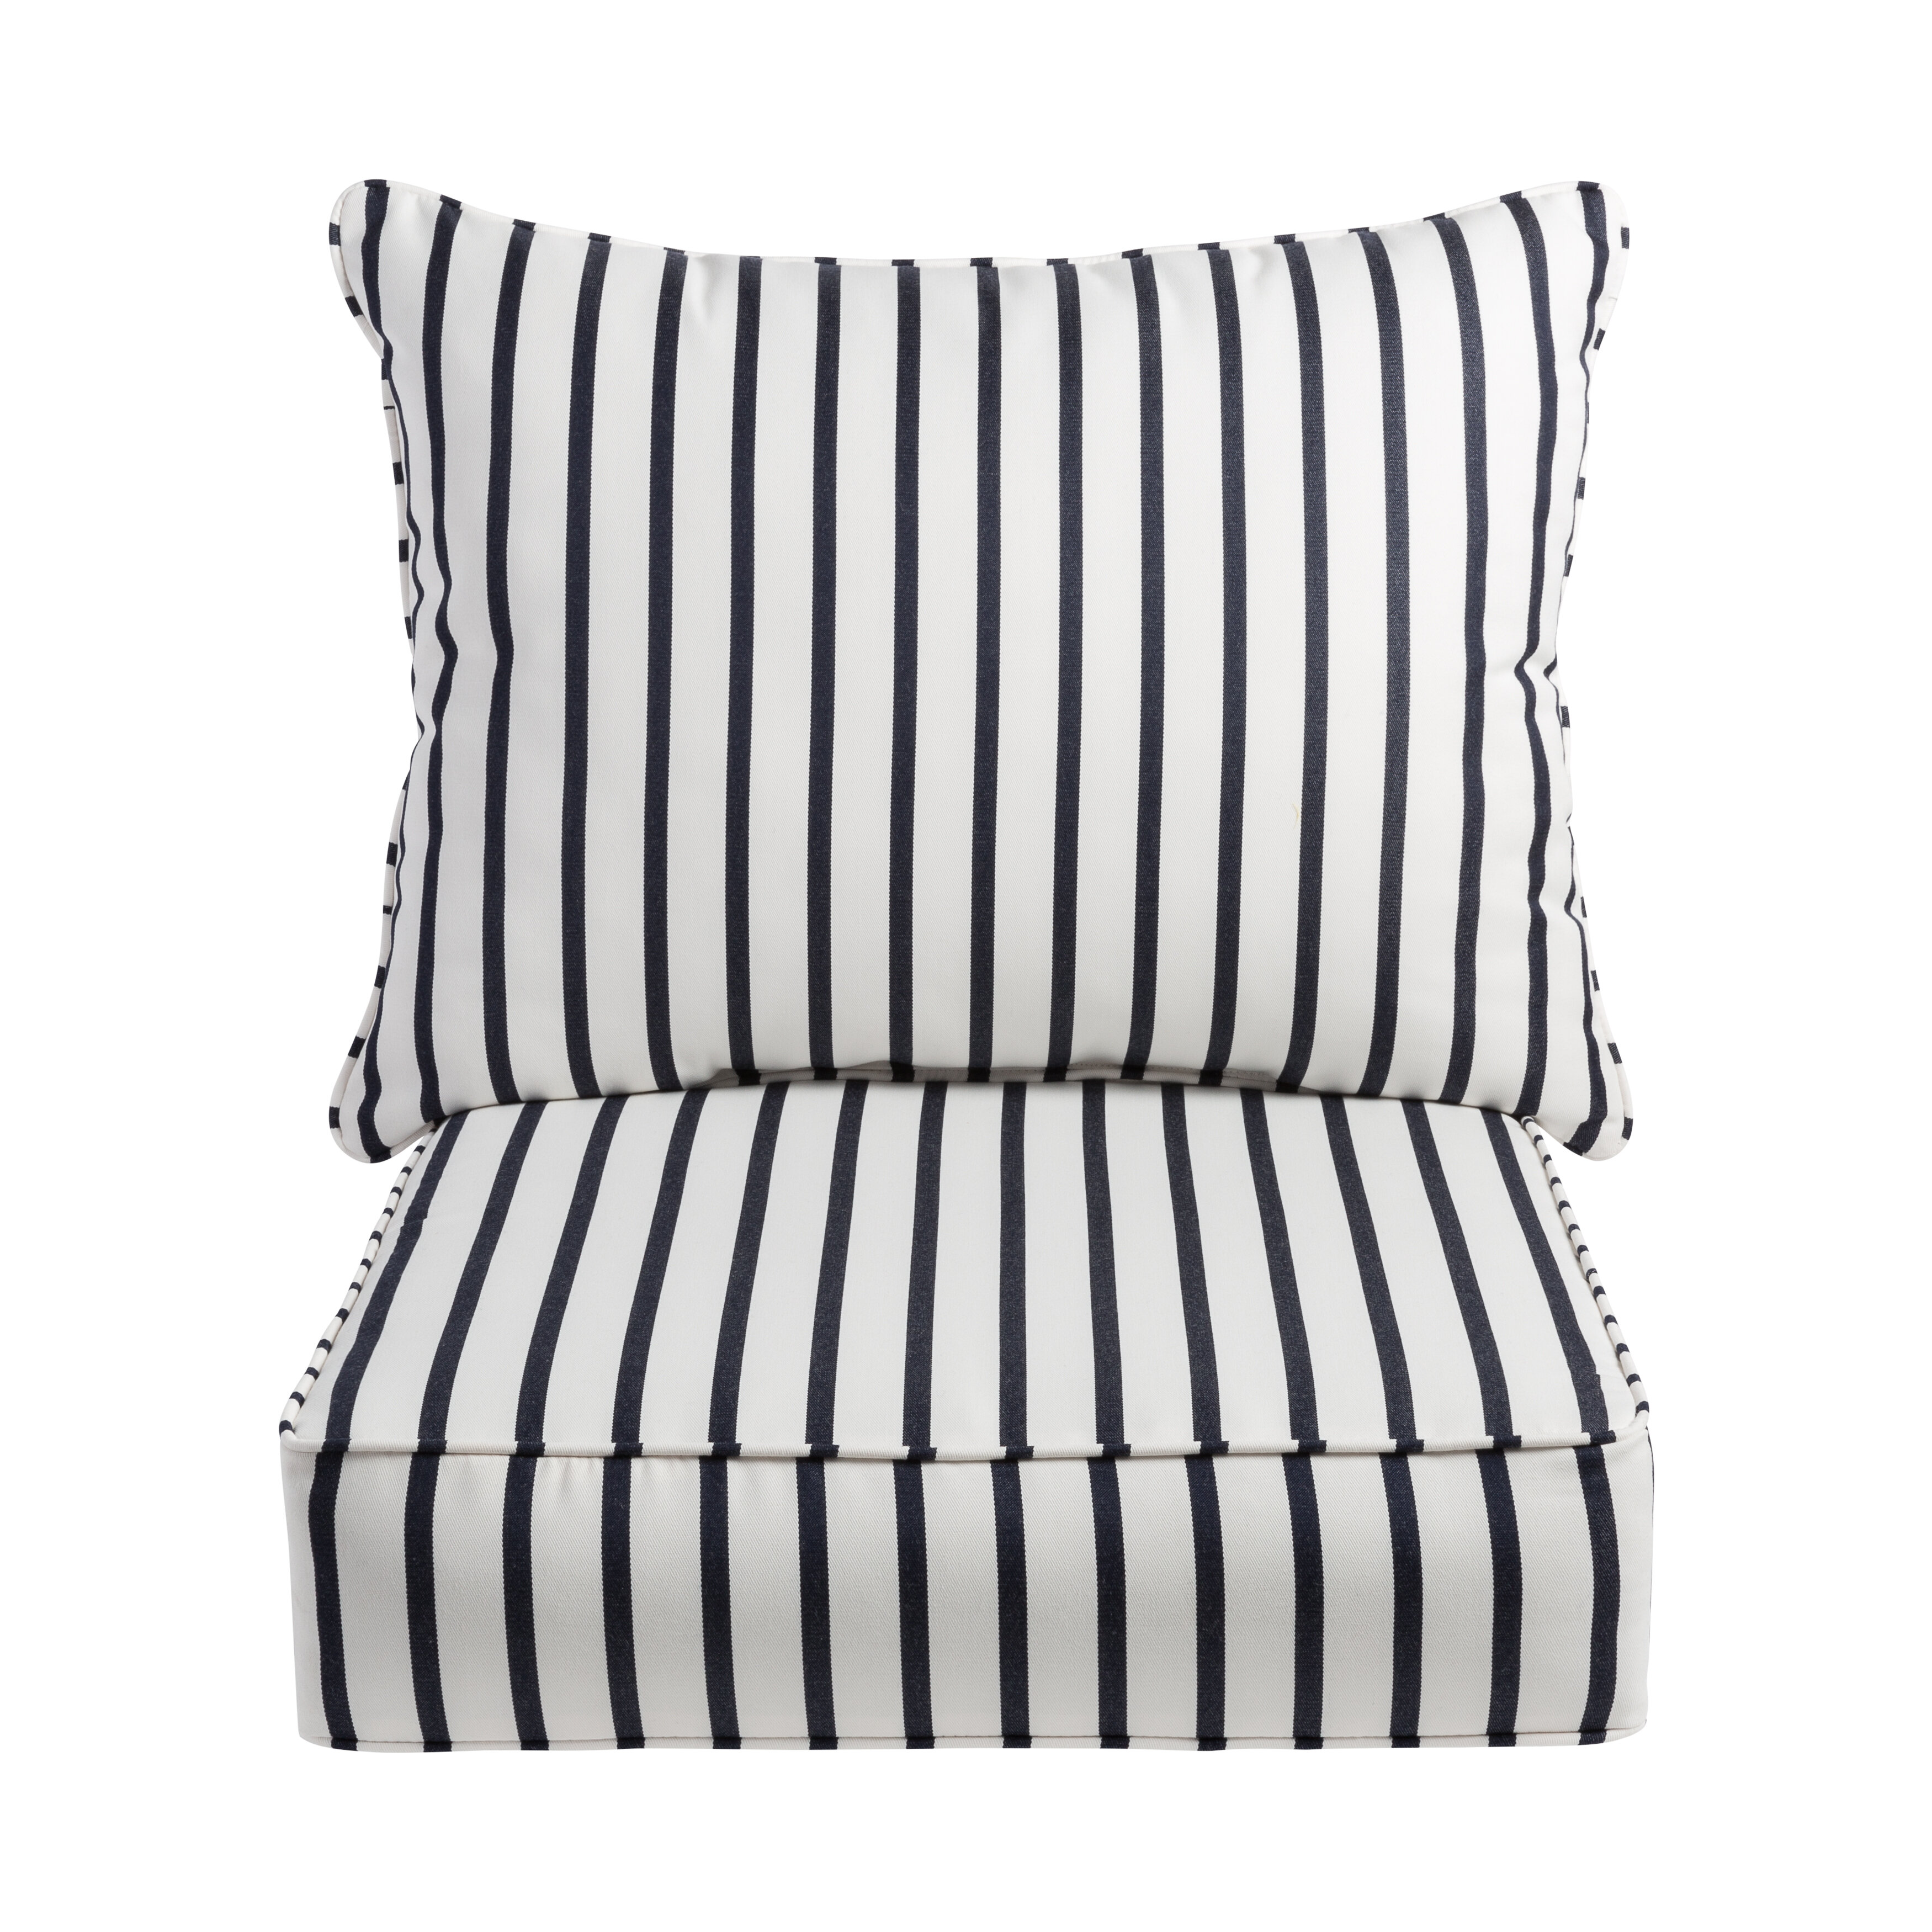 mercury row stripe indoor outdoor sunbrella lounge chair cushion